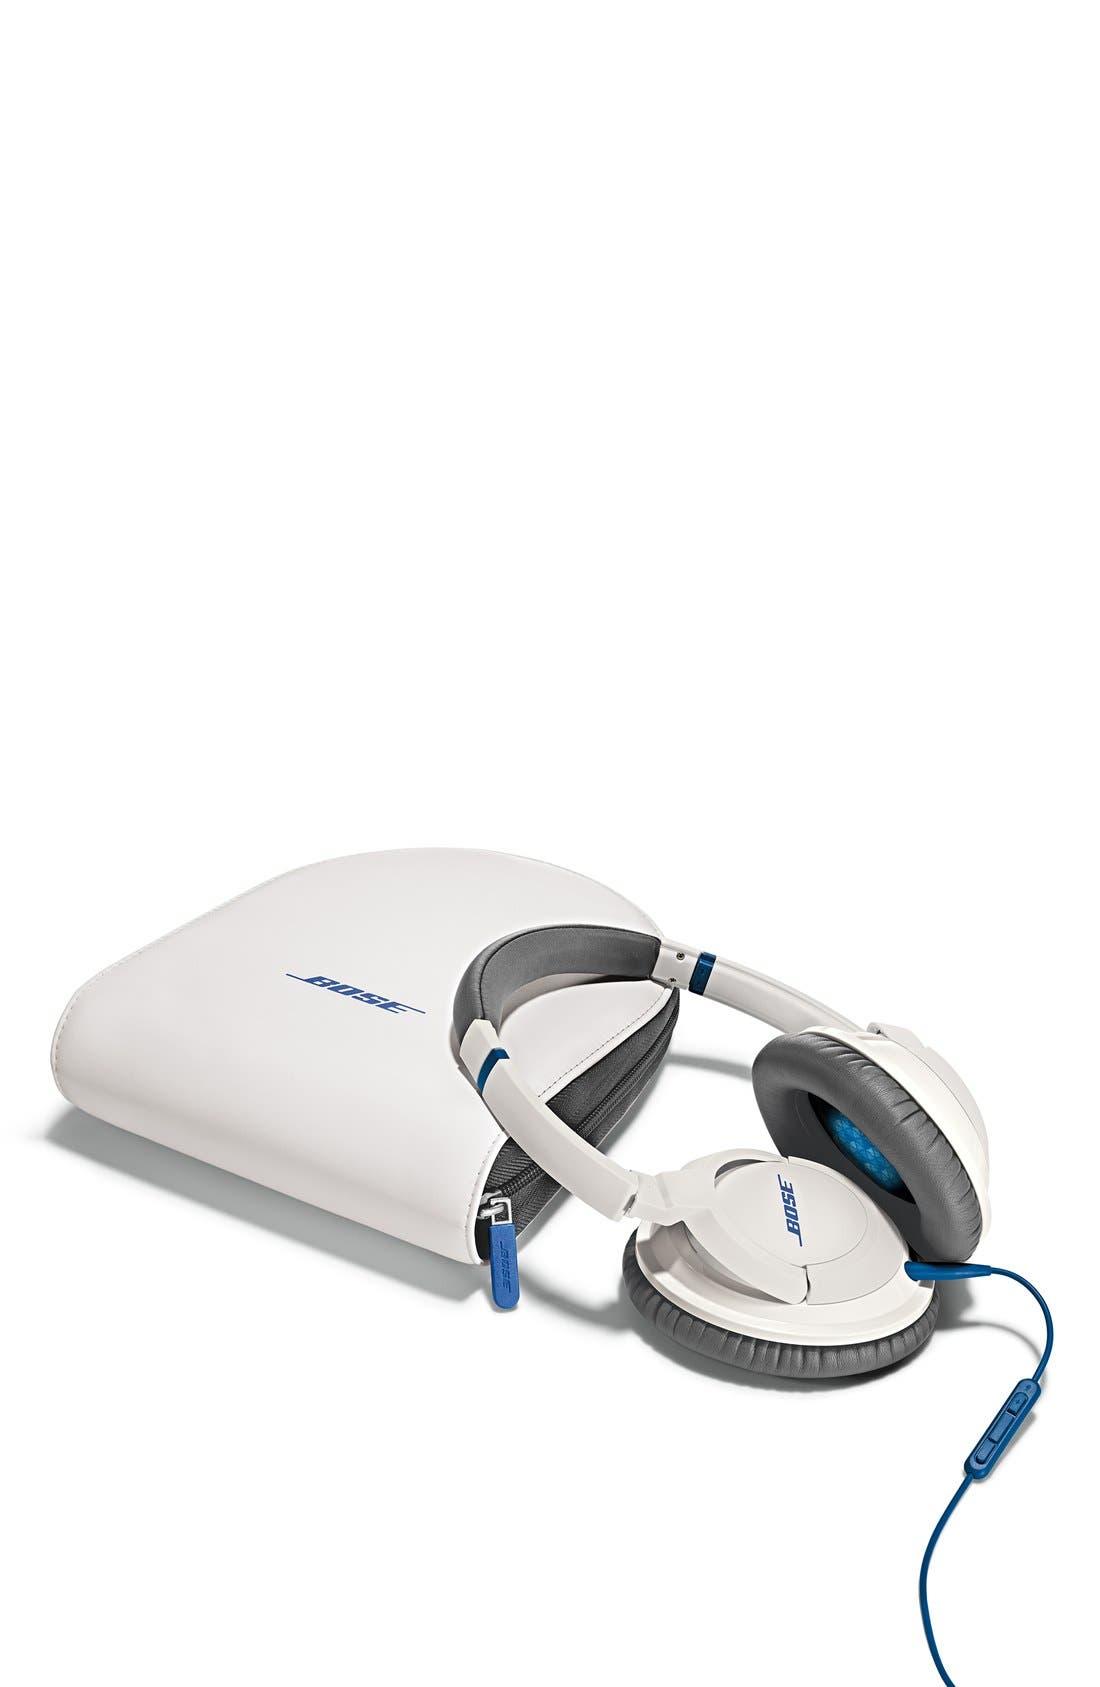 Main Image - Bose® SoundTrue™ Around-Ear Headphones